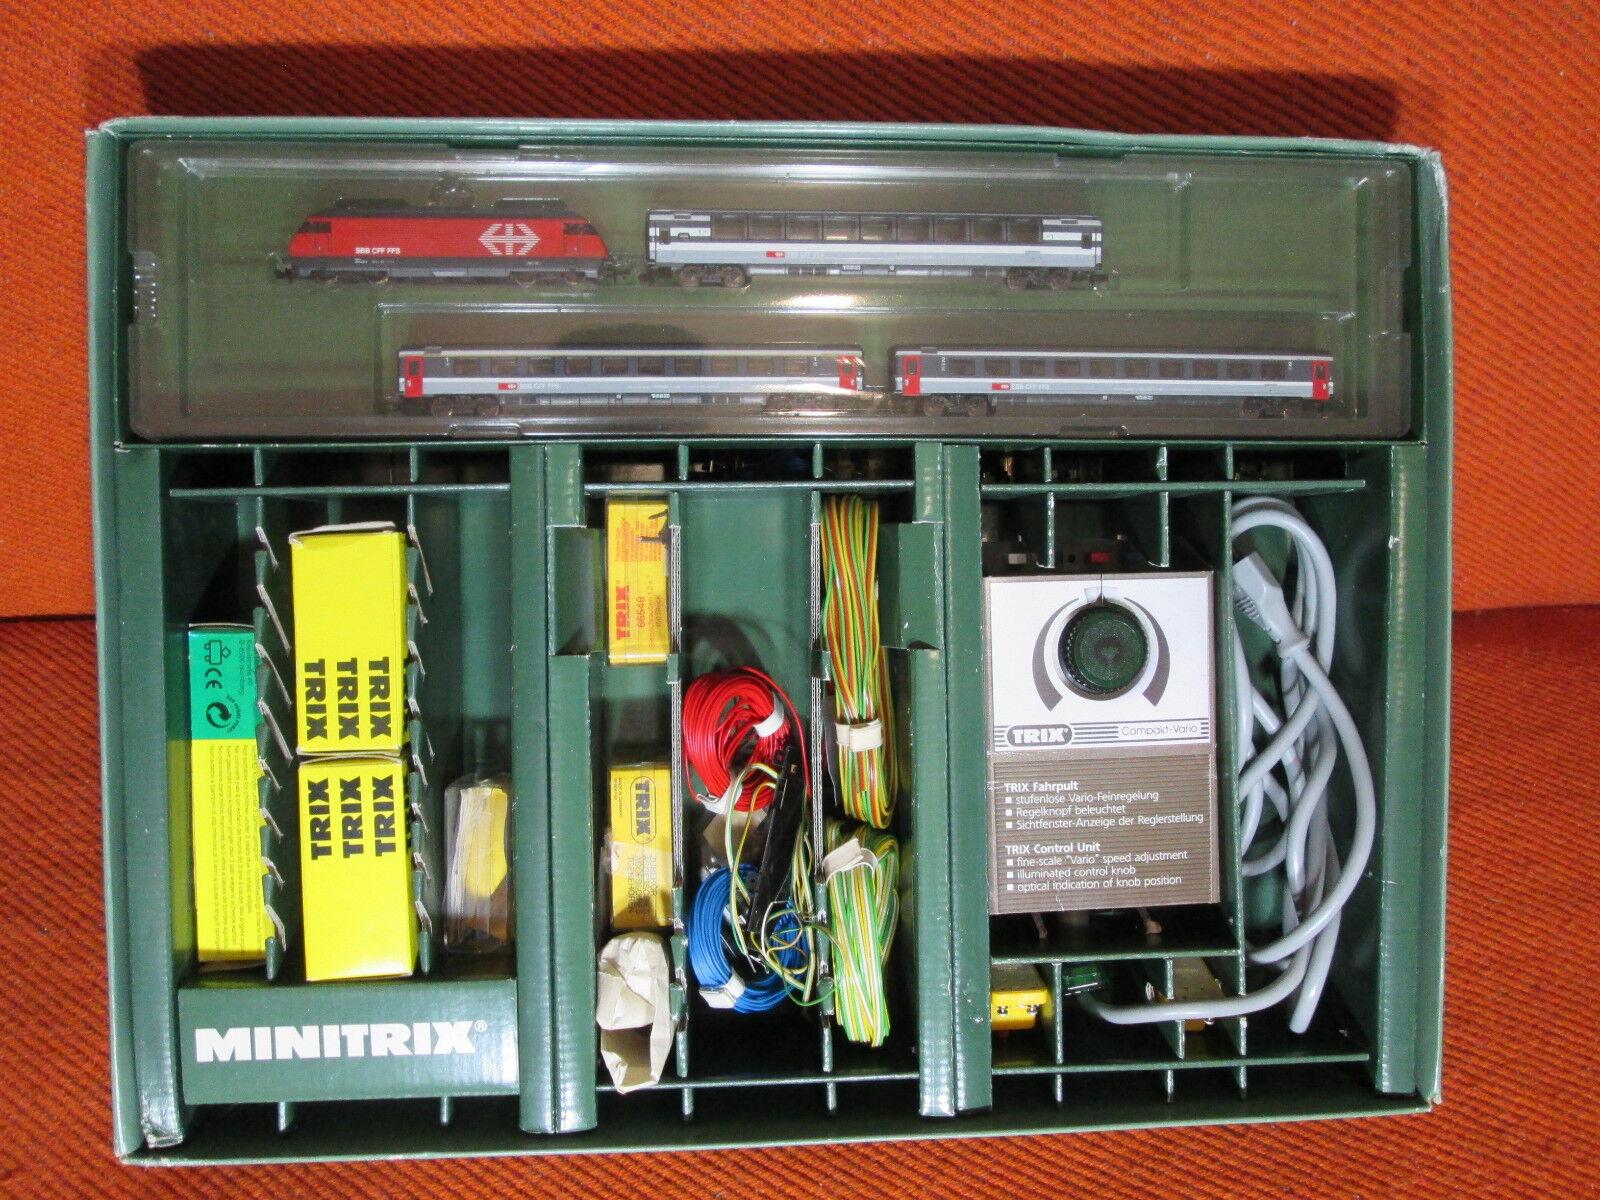 Minitrix 2000 sbb cff ffs N scale Set vintage 94. E-Lok Swiss N 9mm